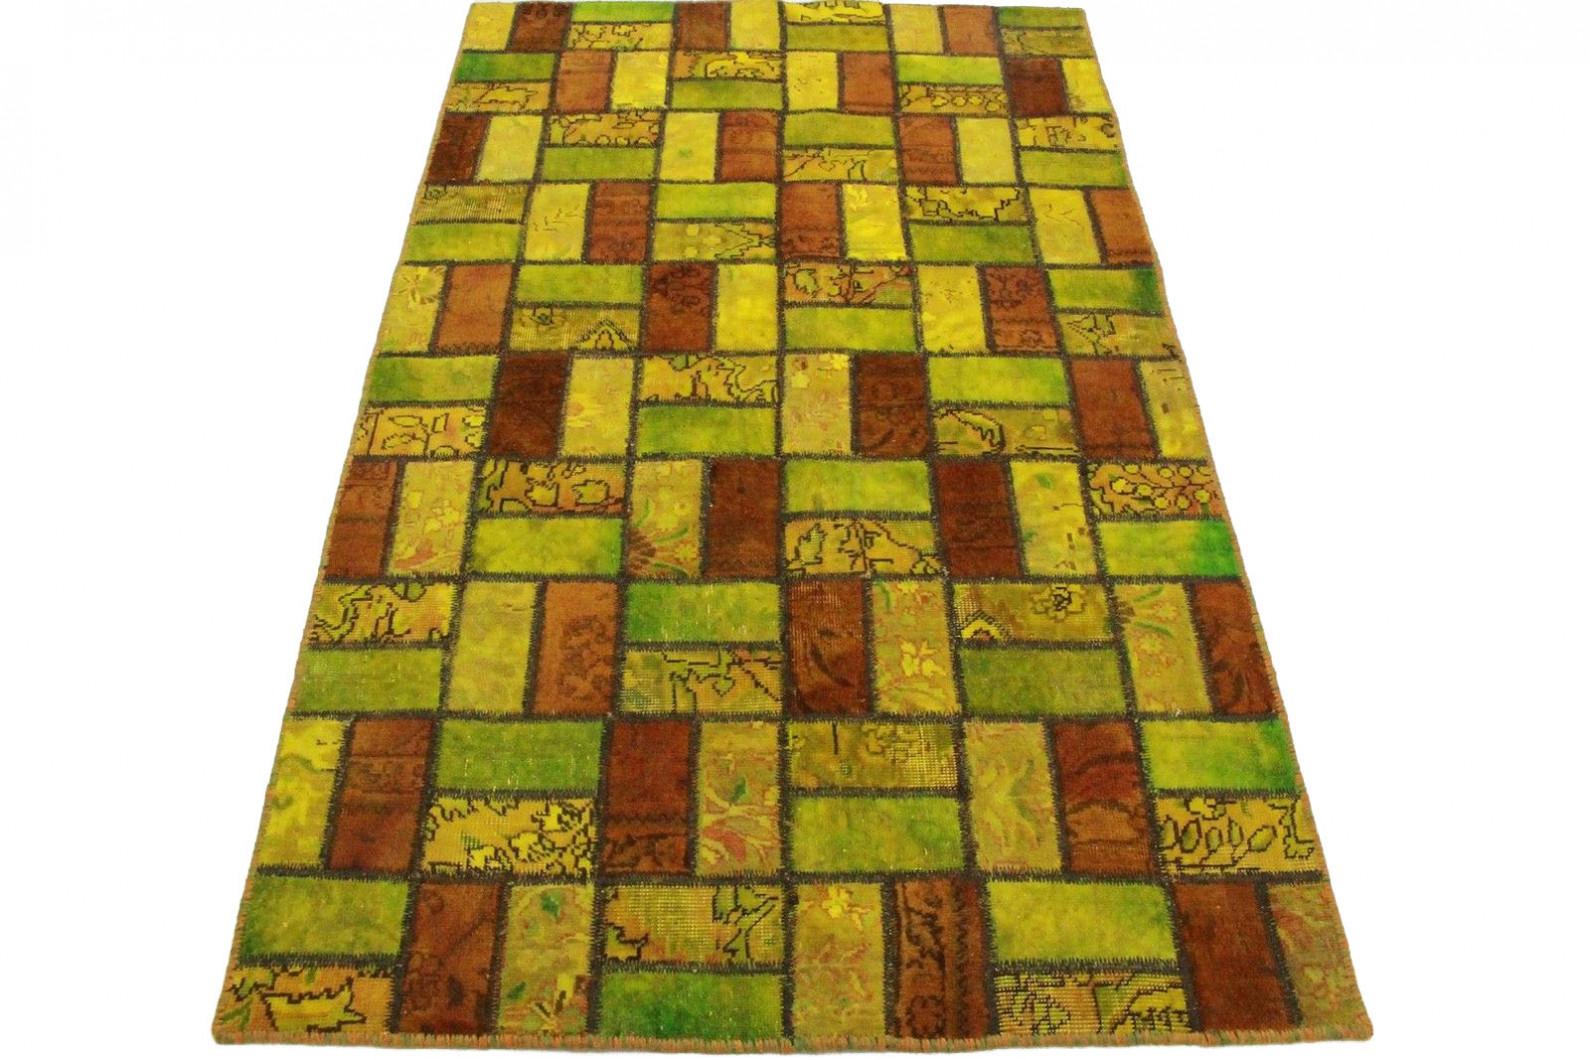 patchwork teppich gr n gelb in 200x120cm 1001 2520 bei. Black Bedroom Furniture Sets. Home Design Ideas